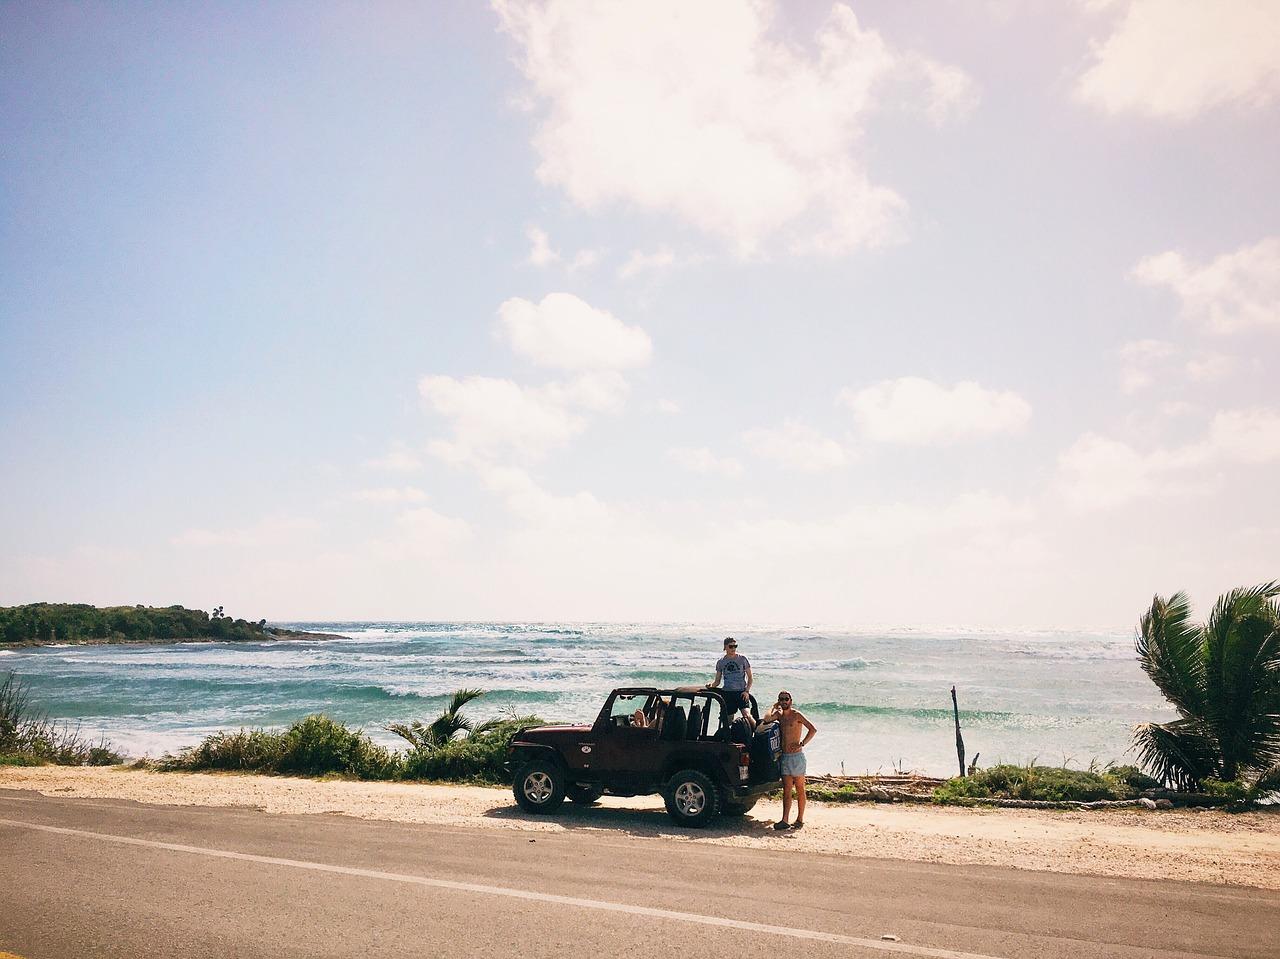 How to prepare for a road trip   Travel blog   Elle Blonde Luxury Lifestyle Destination Blog